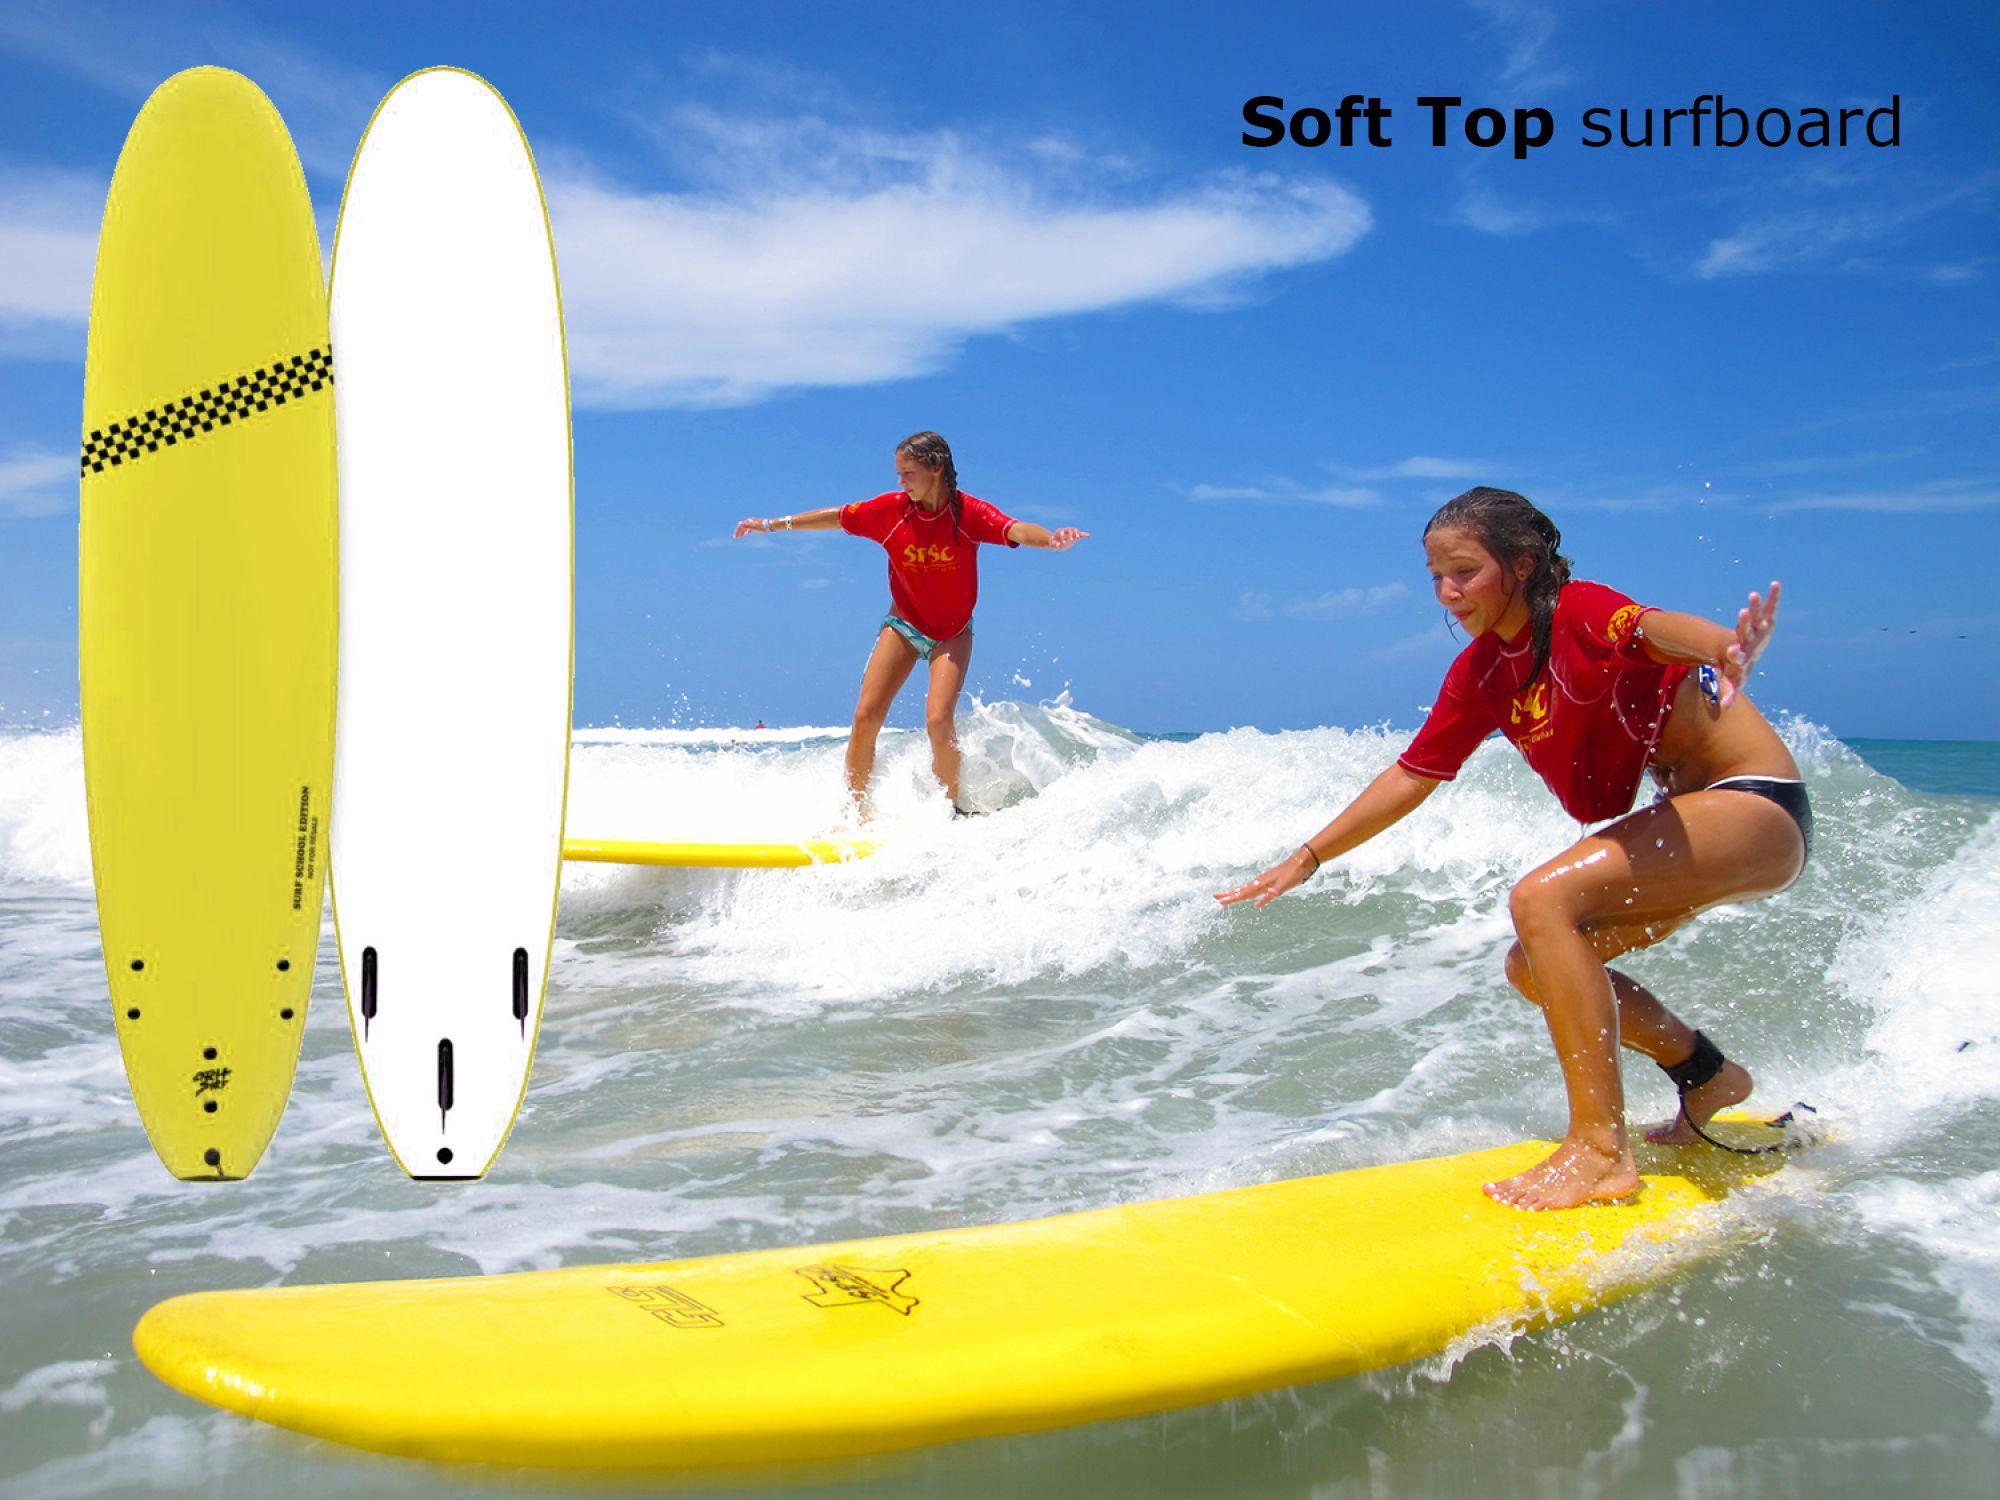 soft top surfboard